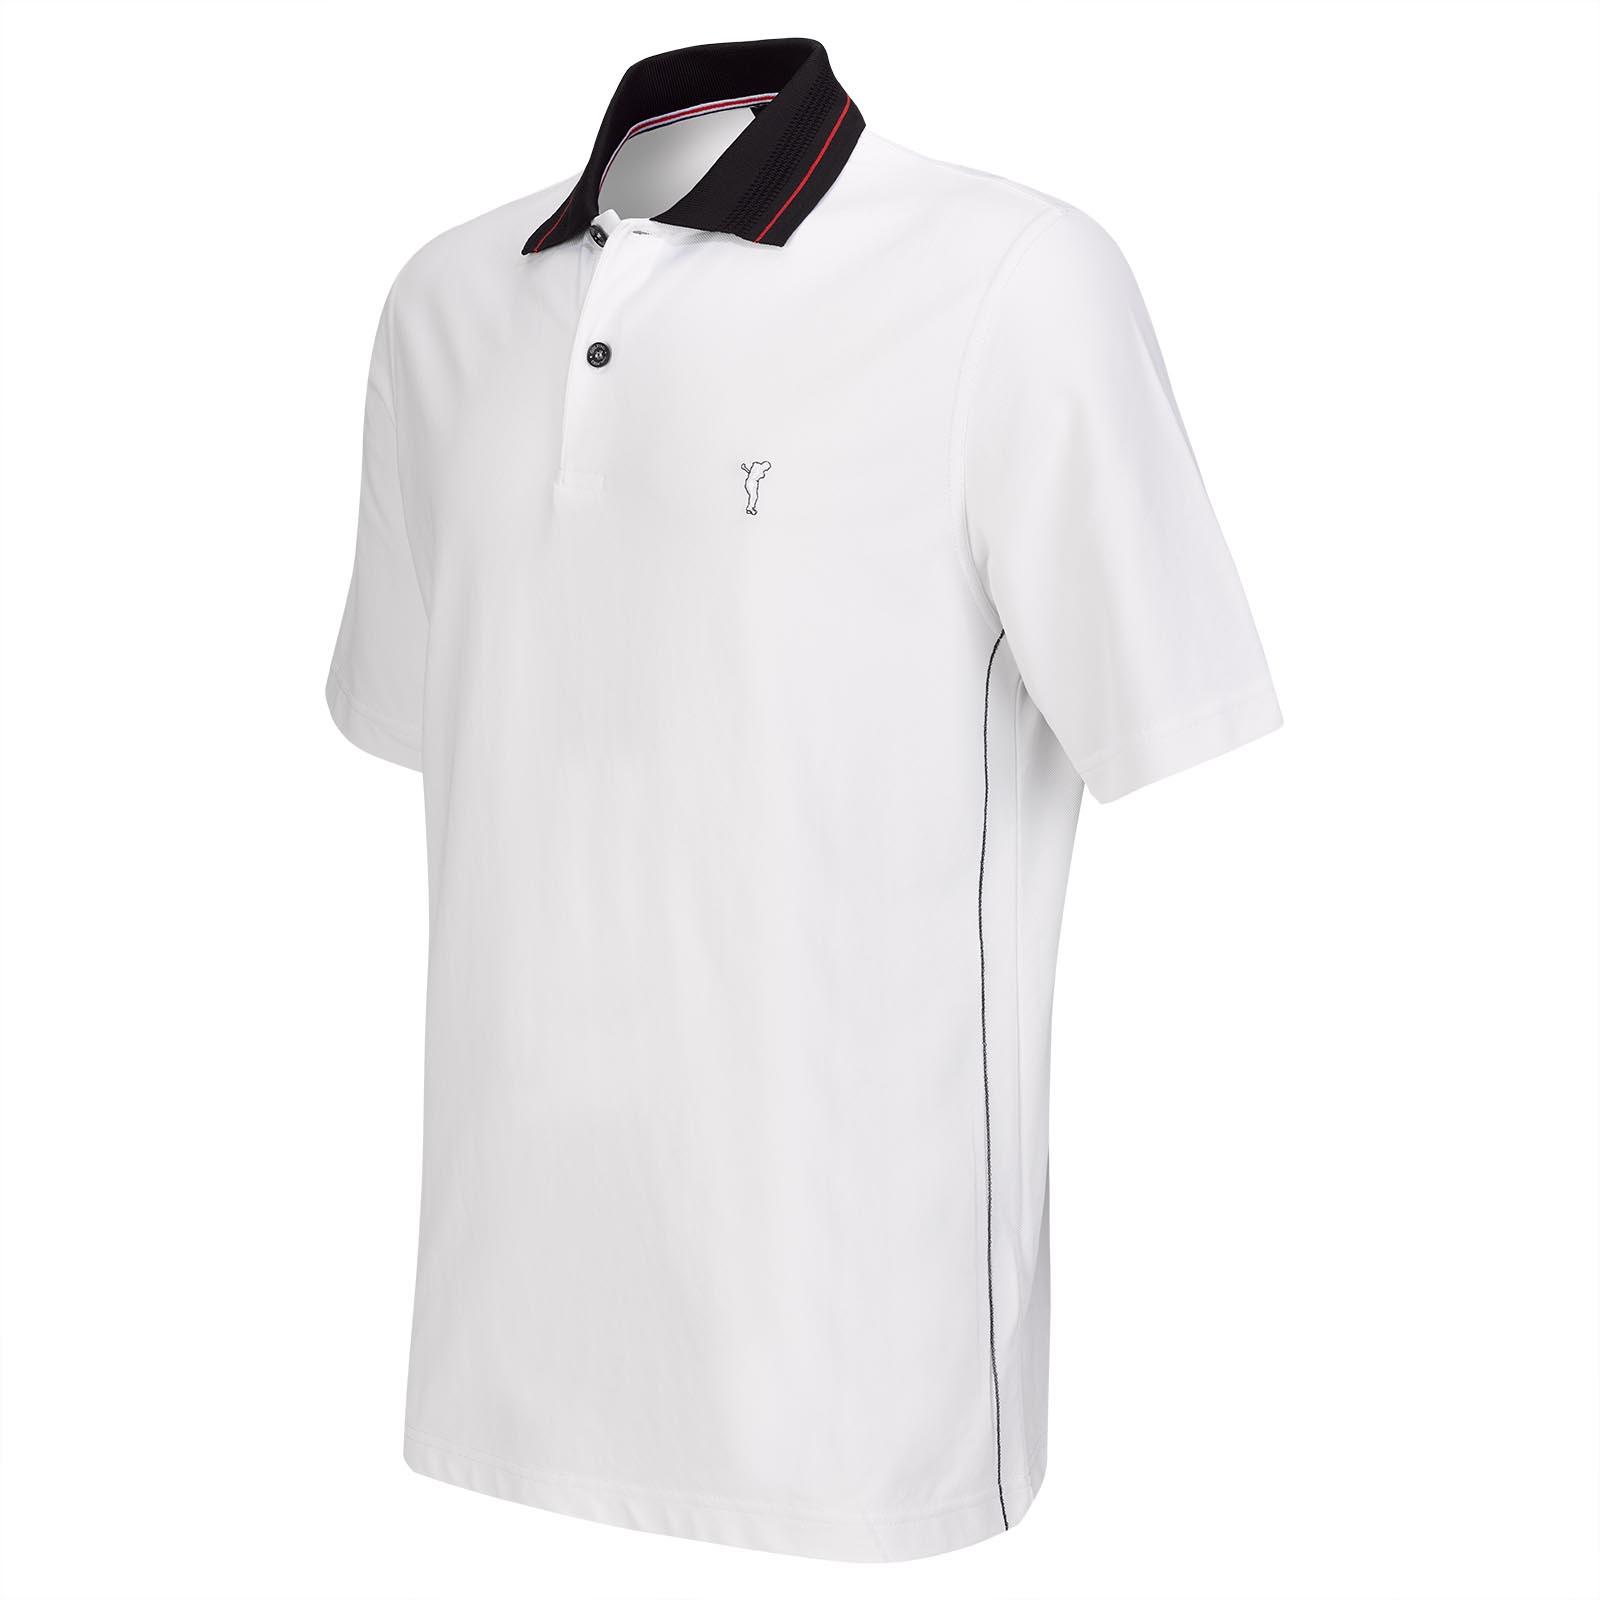 Extra Dry Red Performance Kurzarm Herren Golfpiqué mit softer Haptik